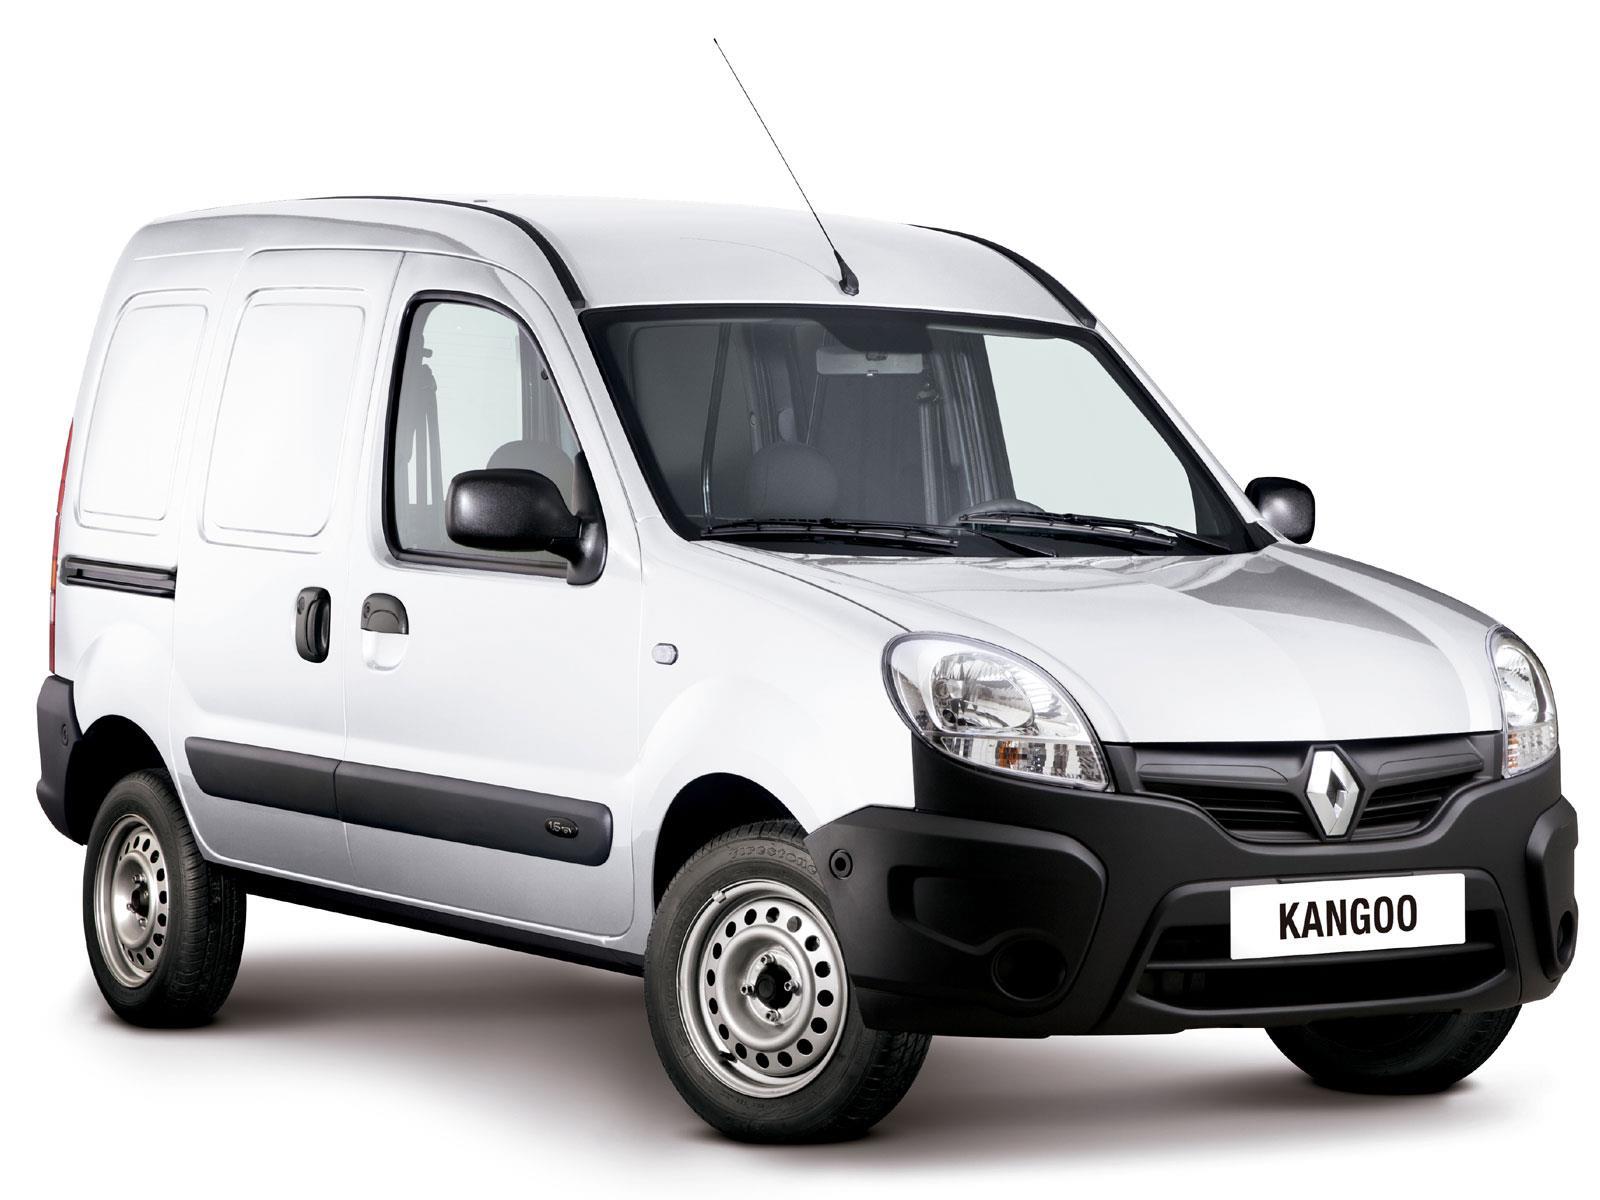 Kangoo - <b>54 Solicitudes</b>